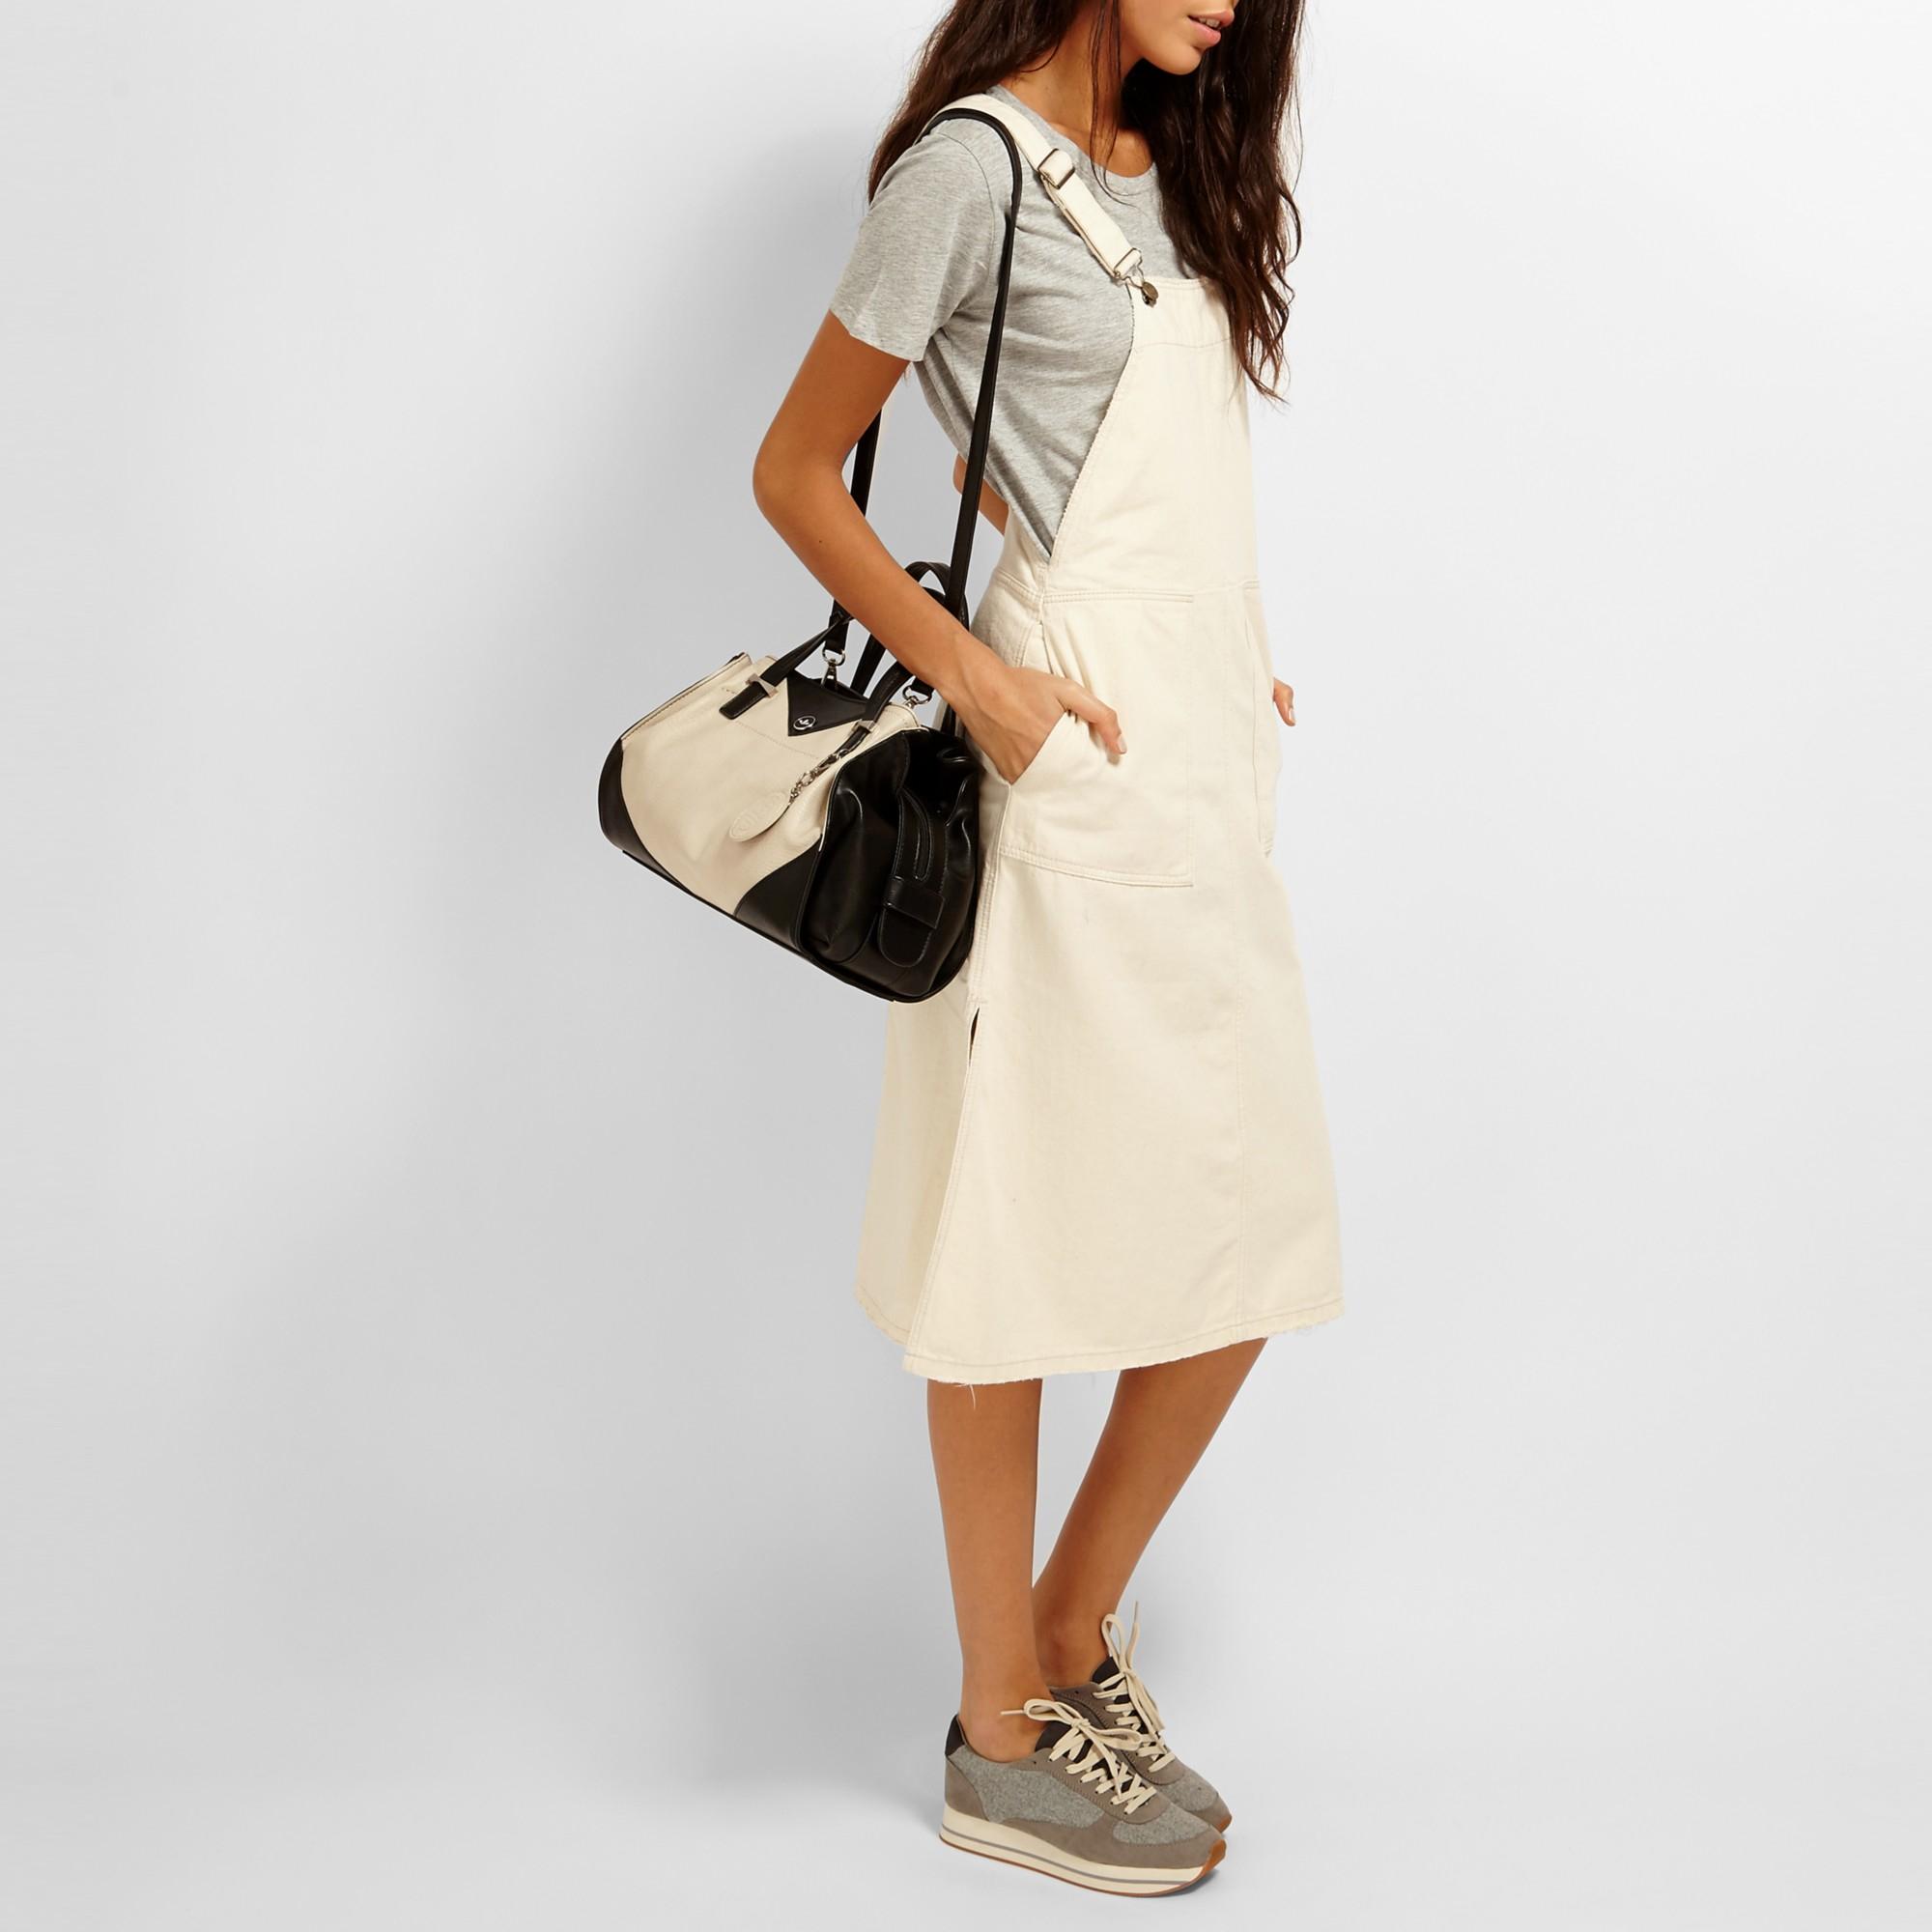 fb0a395a2c2 Nica Ava Grab Bag in Natural - Lyst